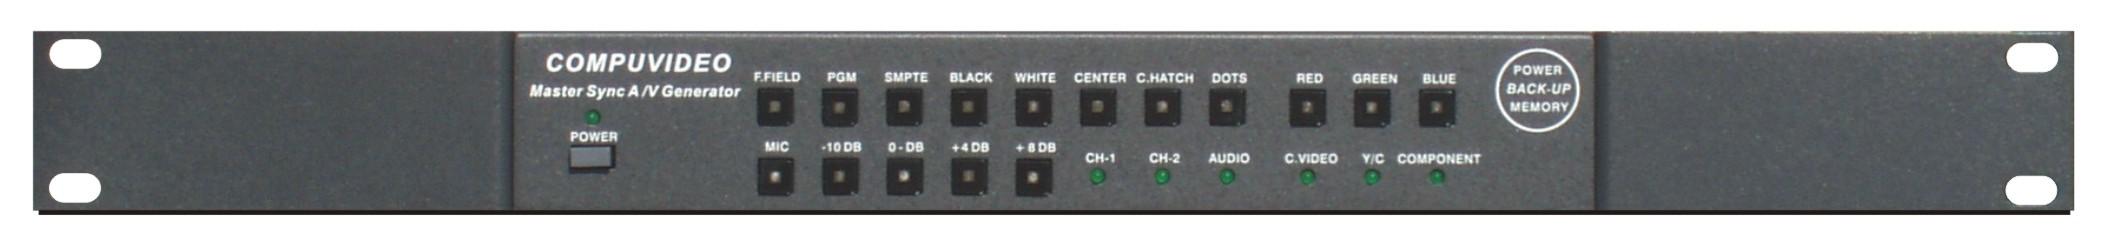 Compuvideo CV-7000 P(RM)